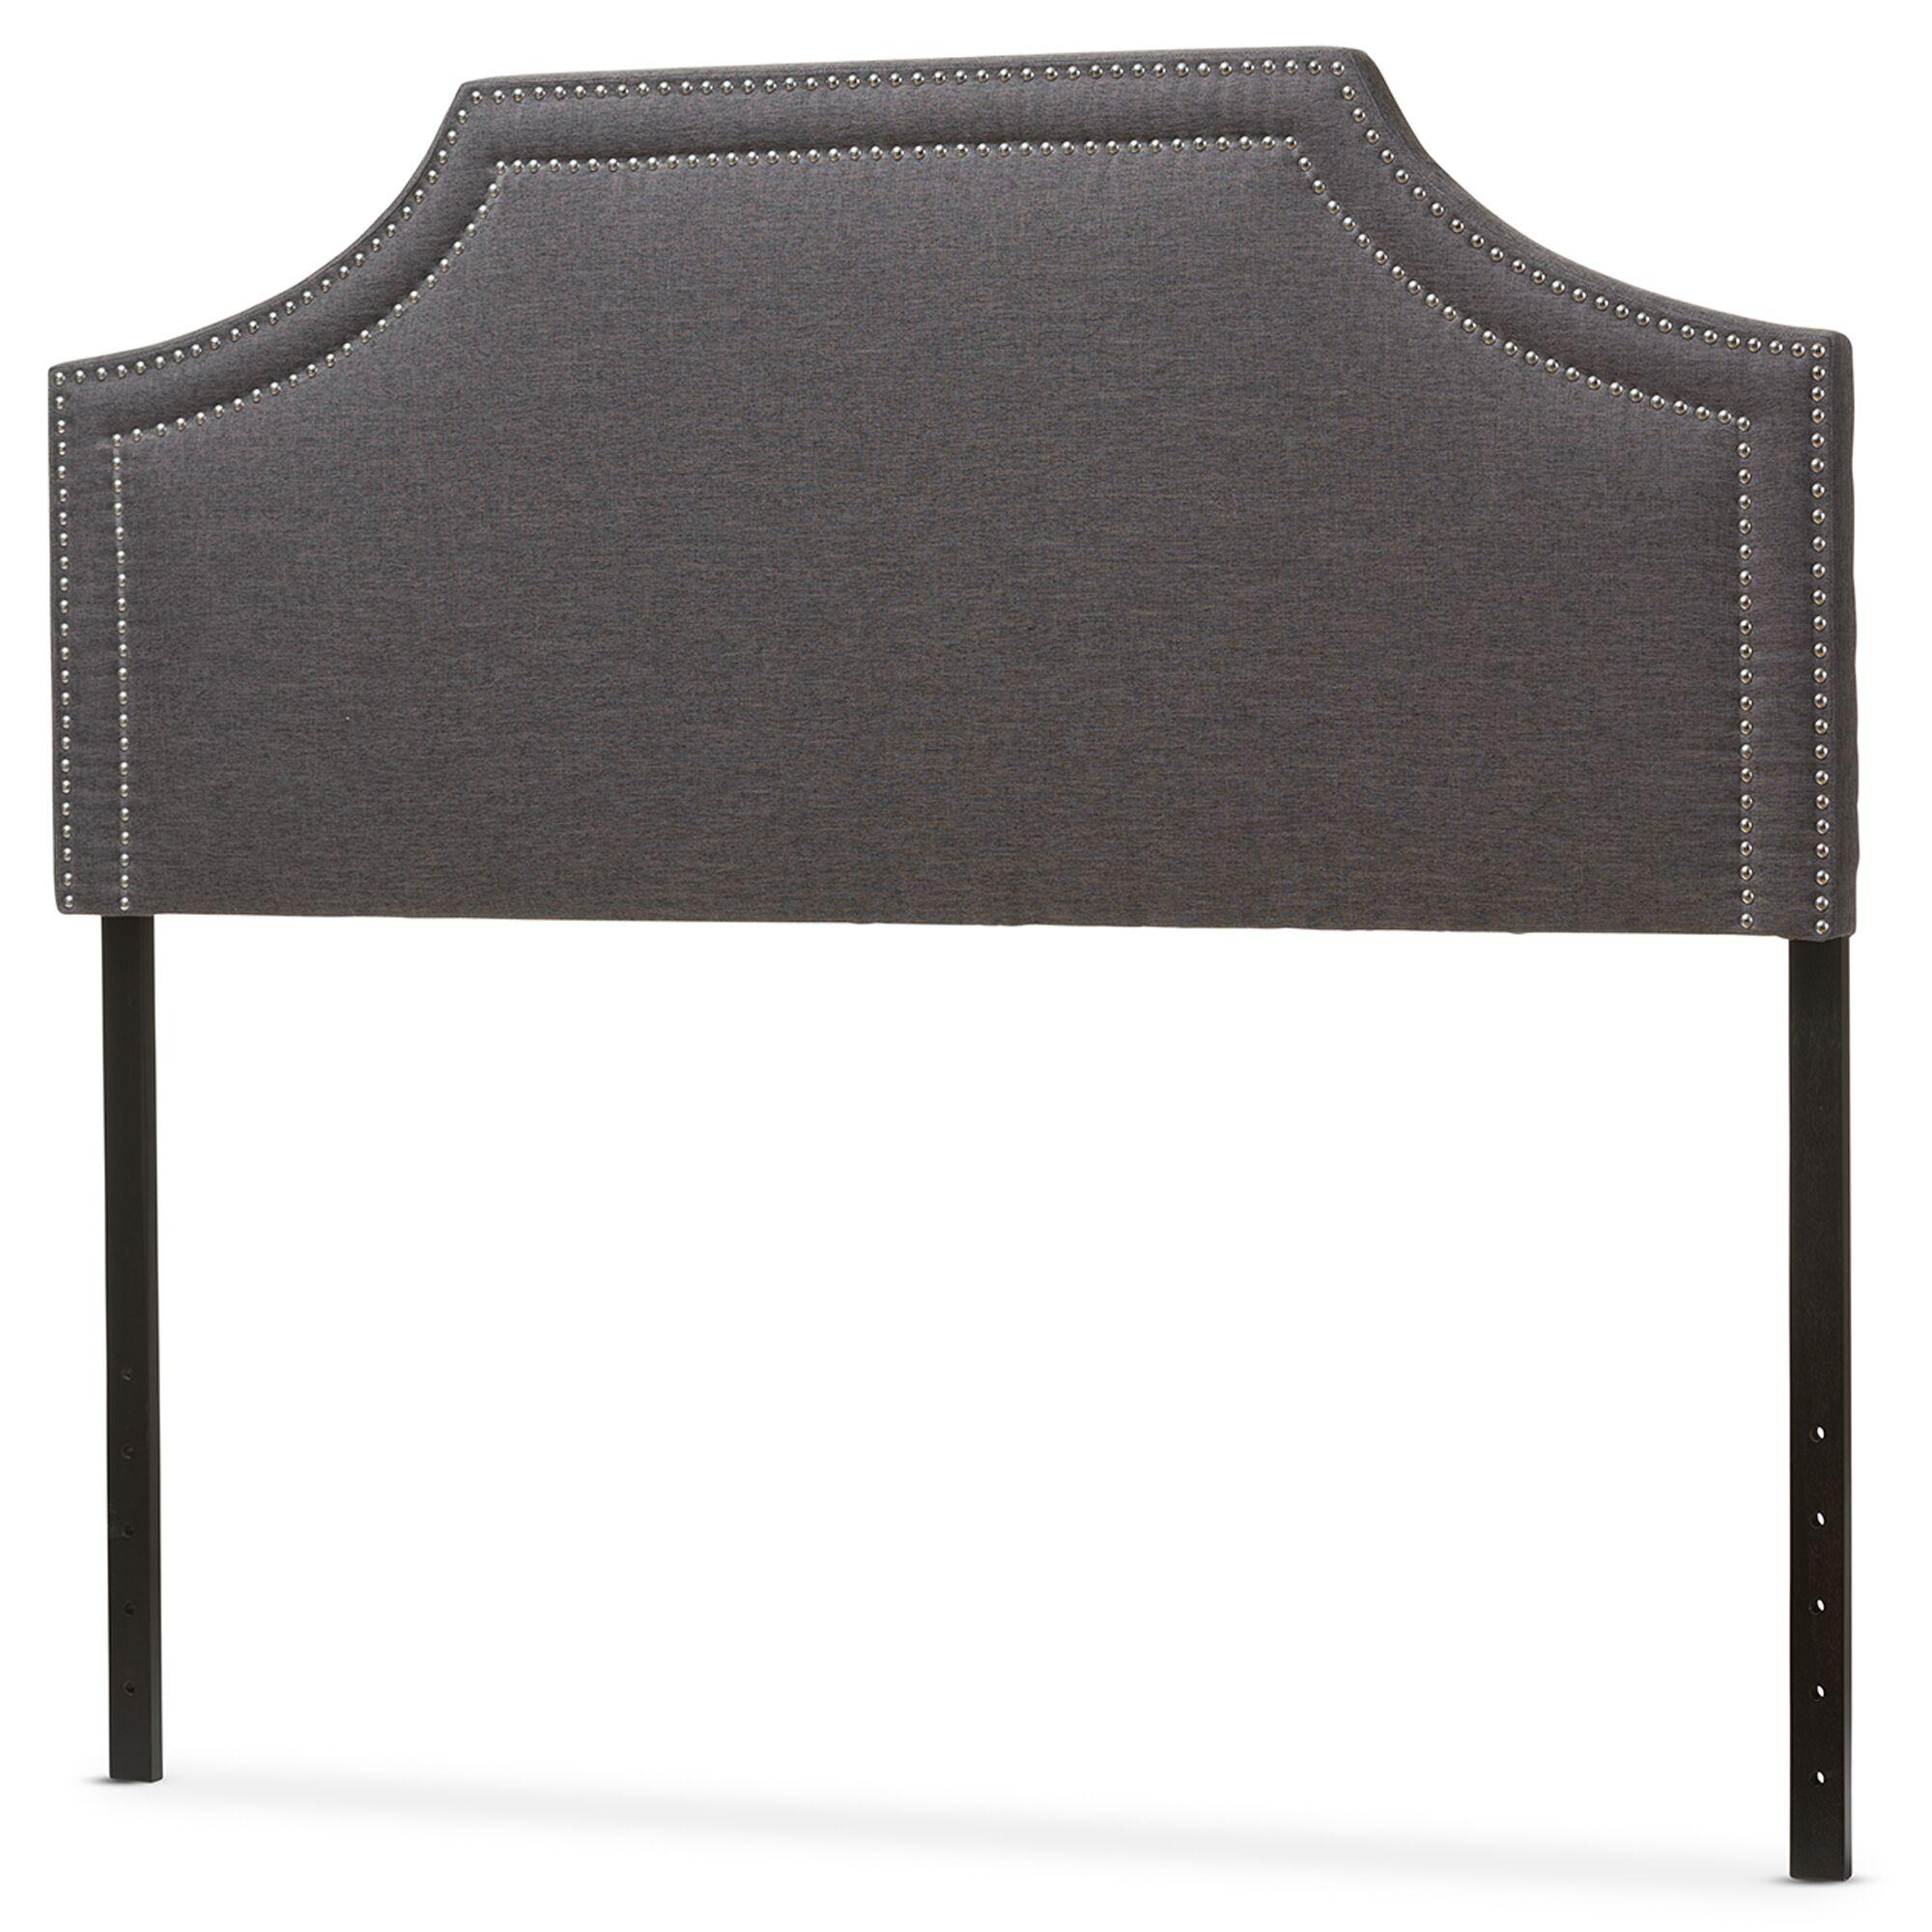 Albee Upholstered Panel Headboard Upholstery: Dark Gray, Size: King